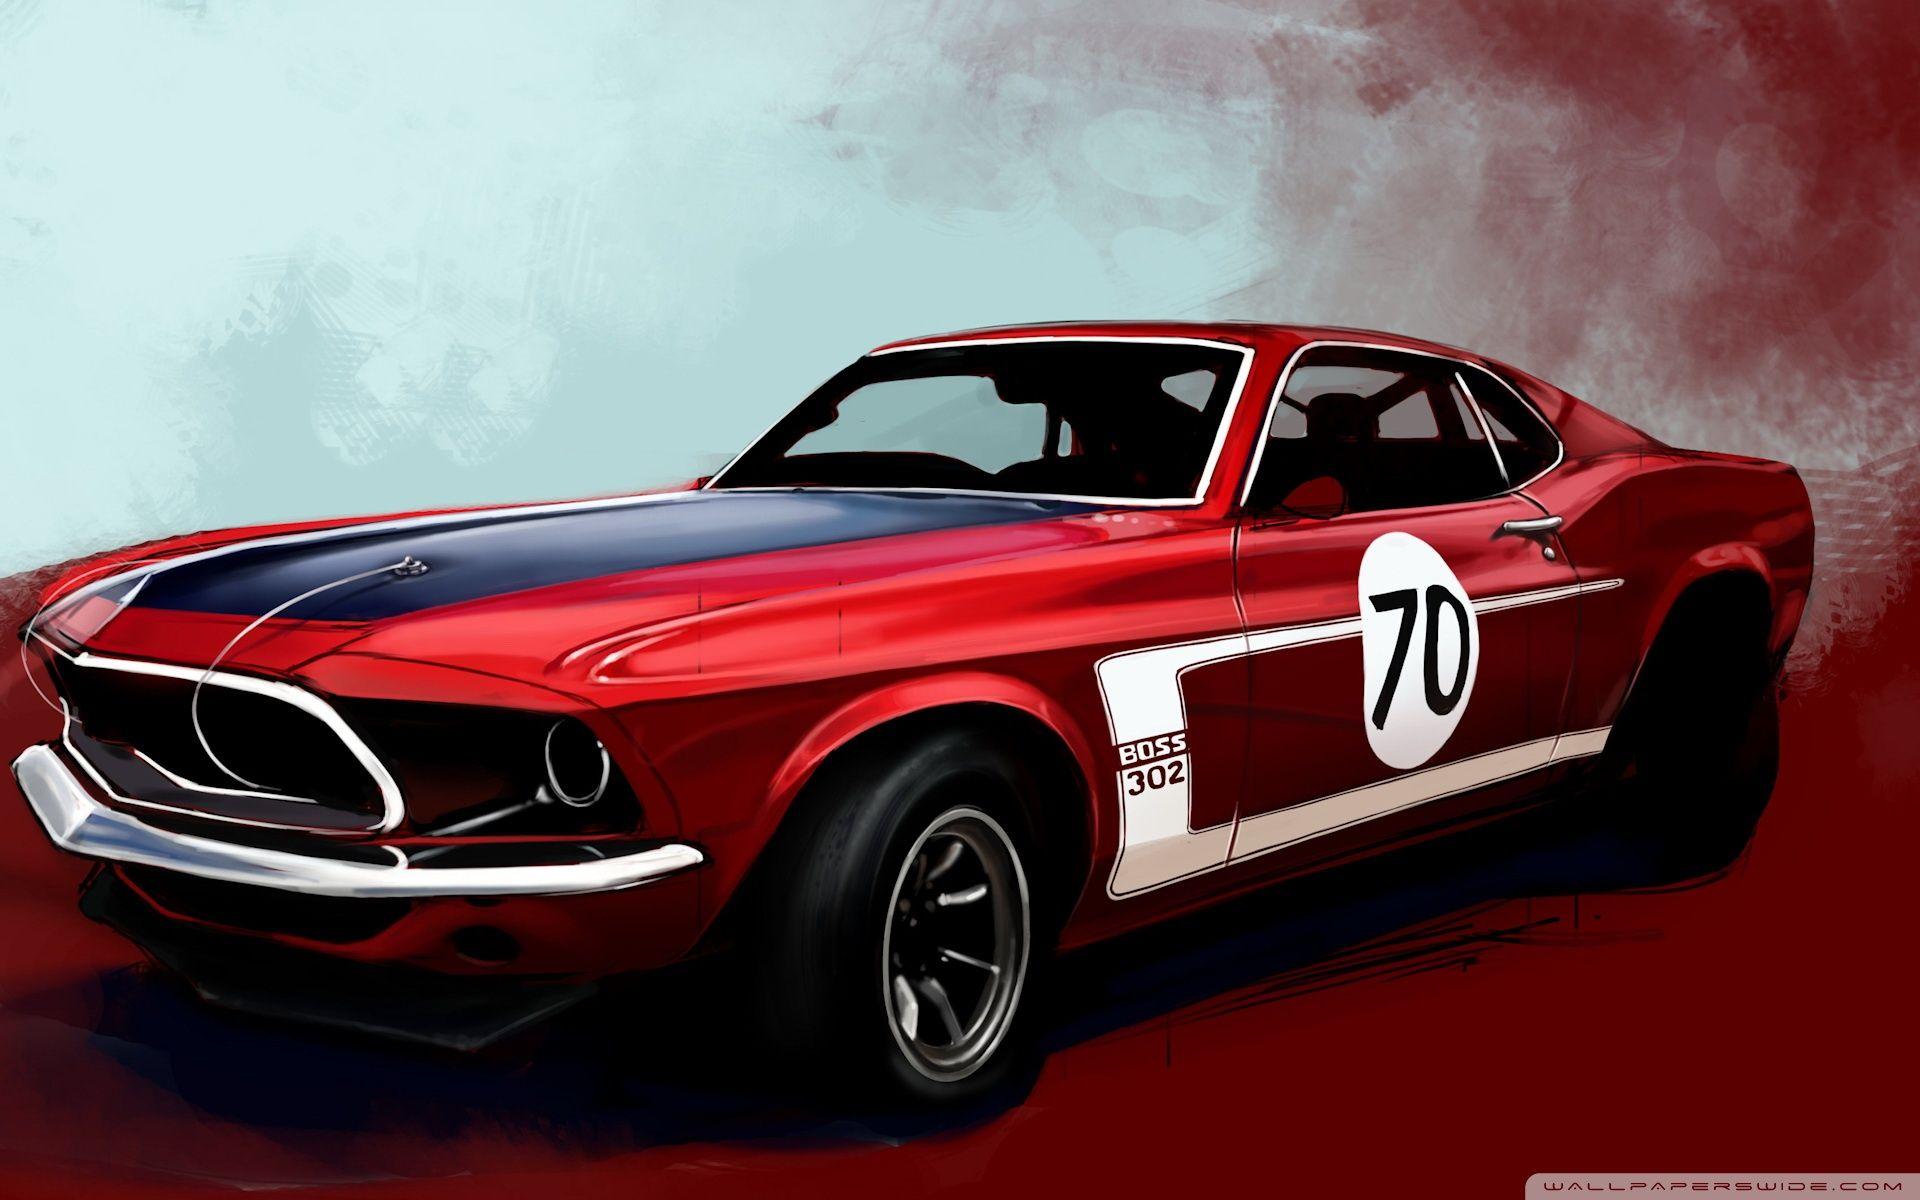 Download Ford Mustang Boss 302 Classic Car Hd Wallpaper Tableau